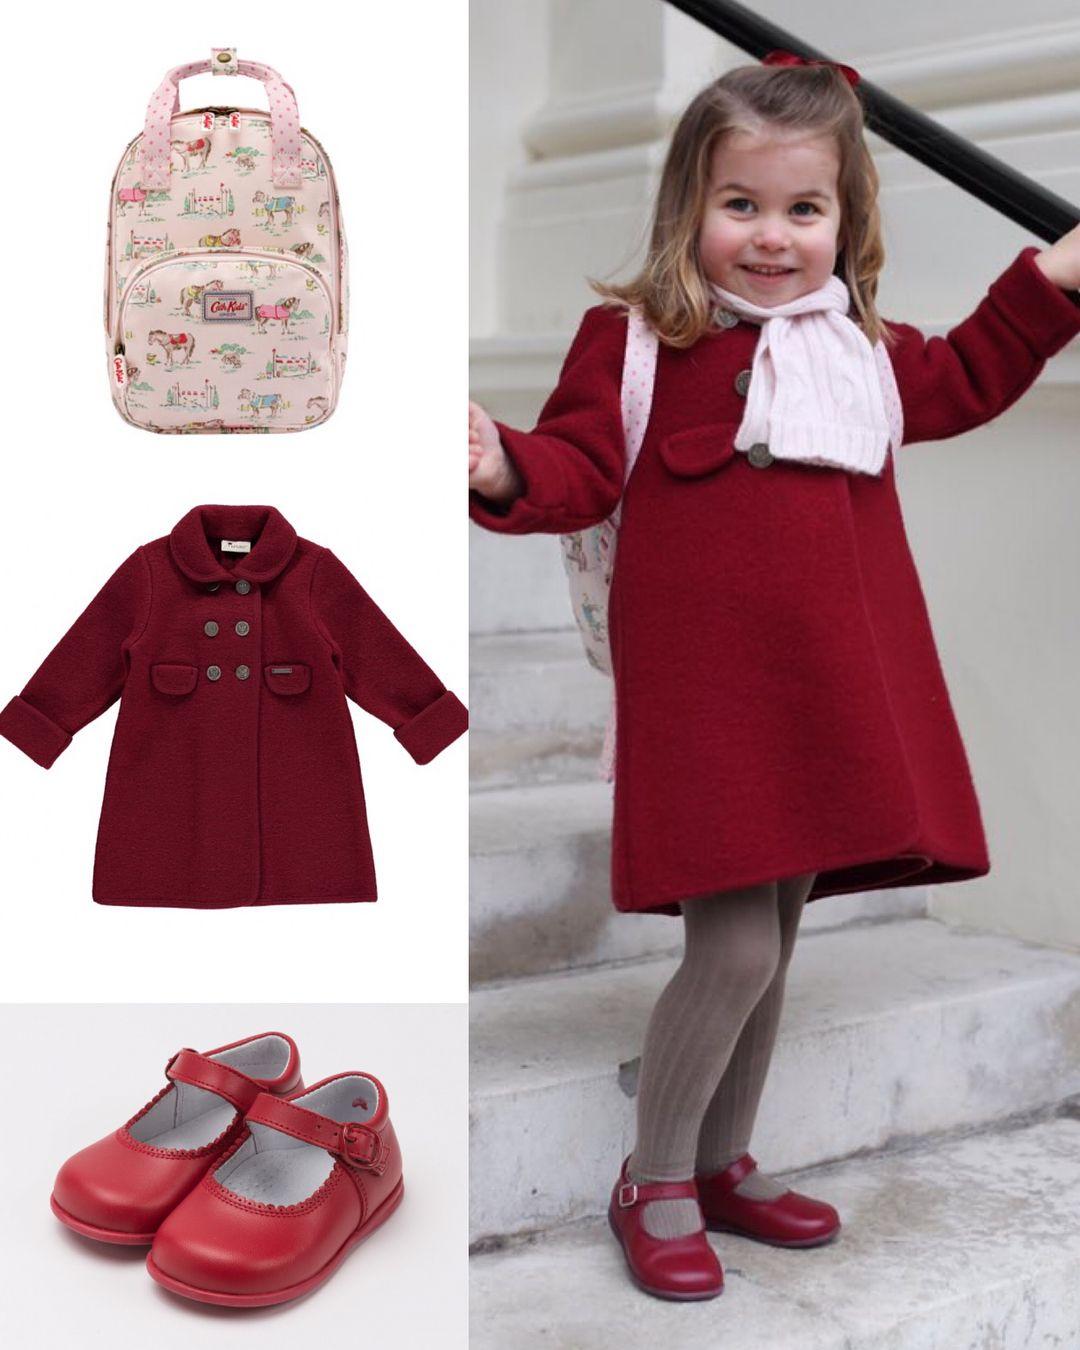 Princess Charlotte Of Cambridge On Her First Day Nursery School Jan 2018